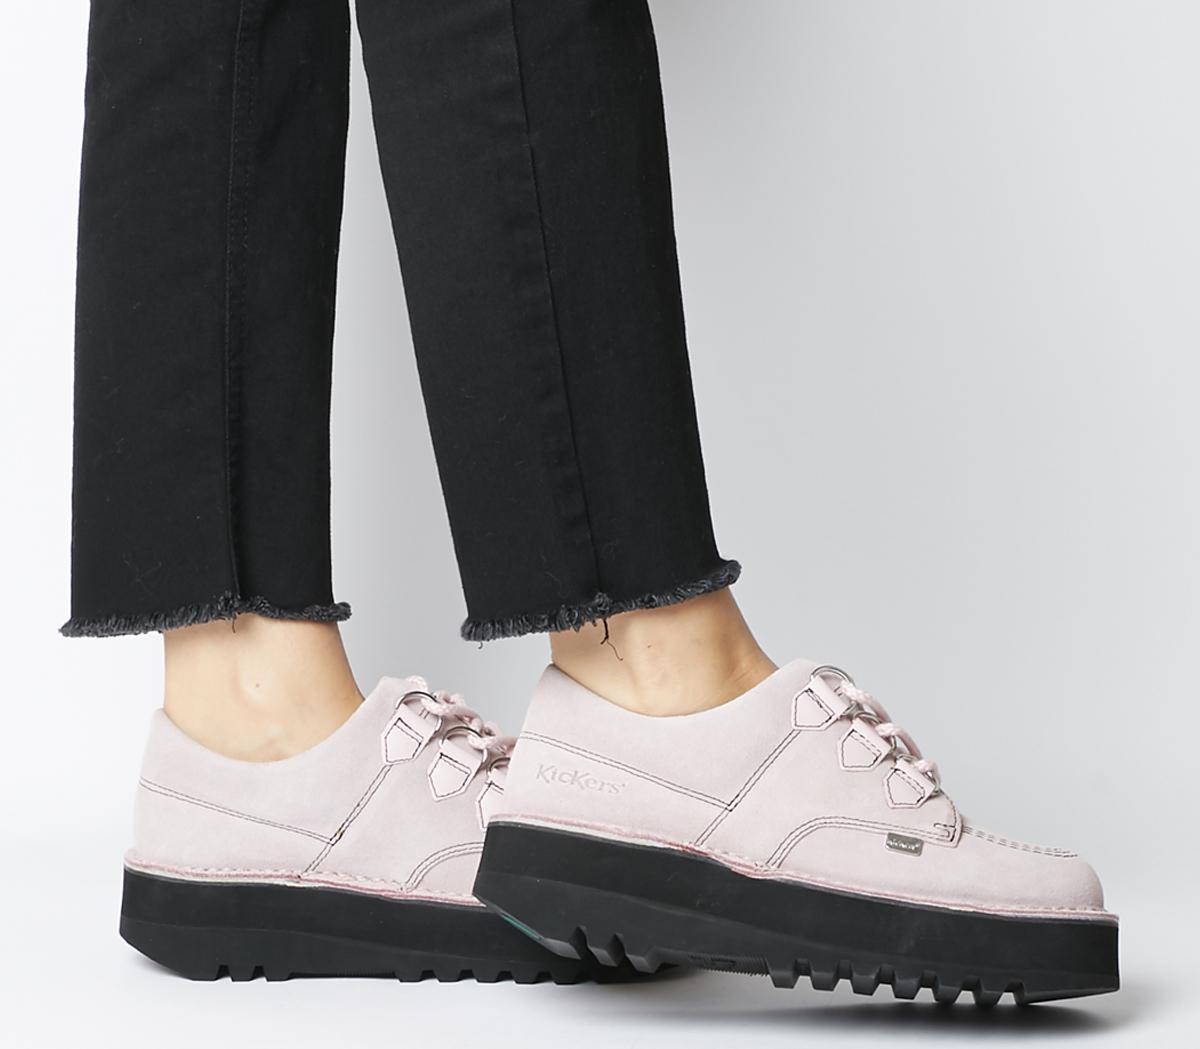 Kickers Kick Lo Creepy Barely Pink - Flats